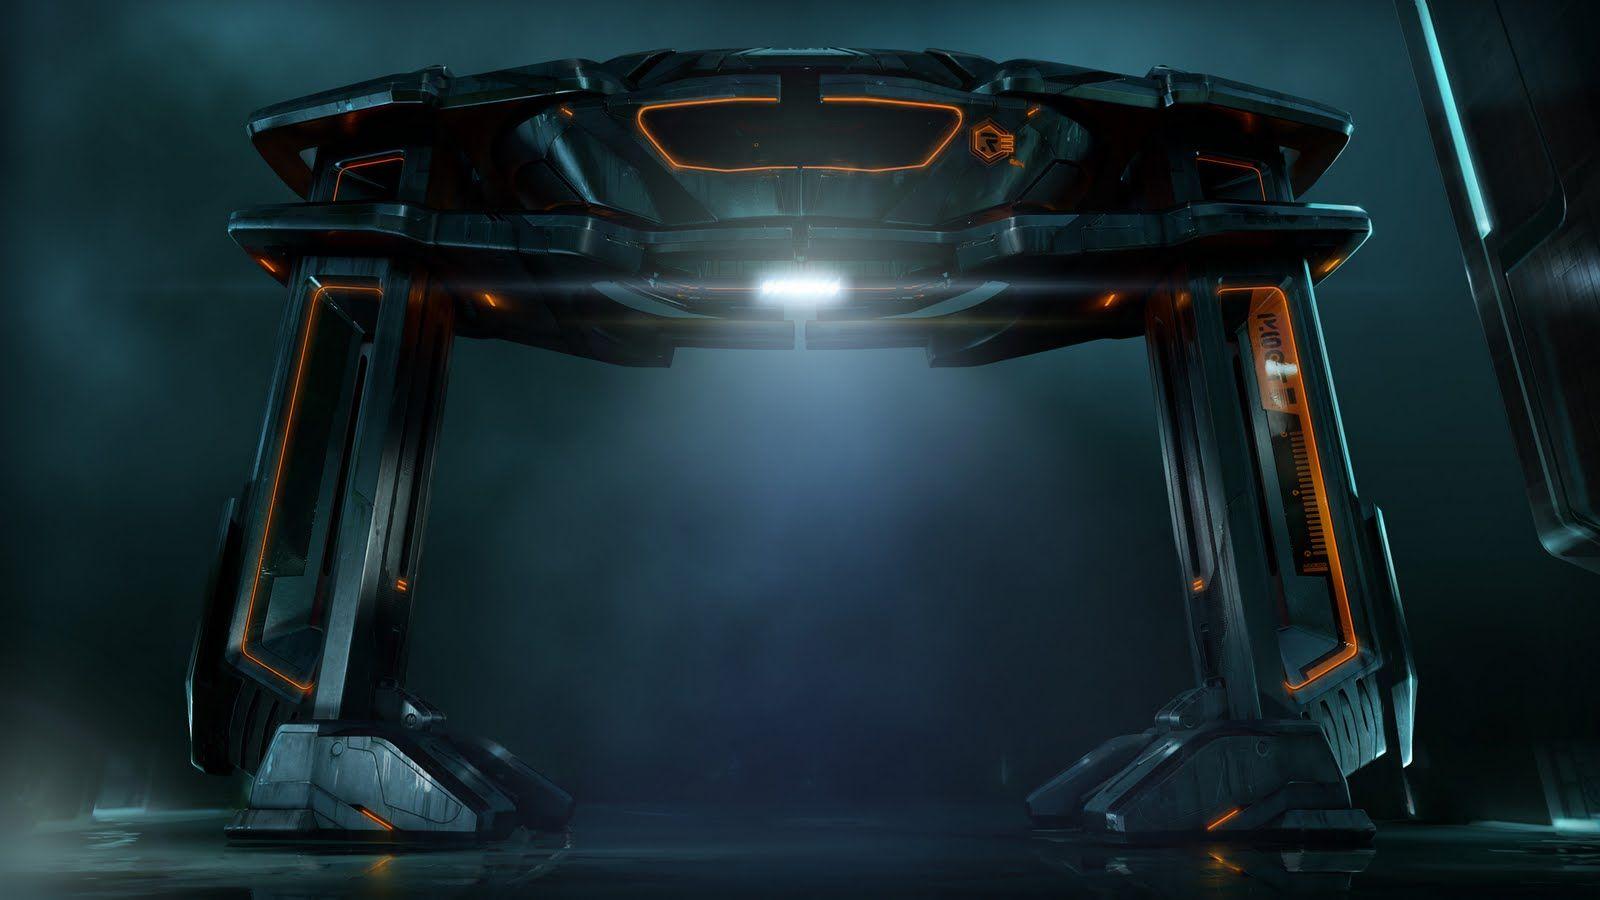 Movie Tron Legacy Cgi Cool Dark Tron Legacy Wallpaper Tron Legacy Tron Concept Art